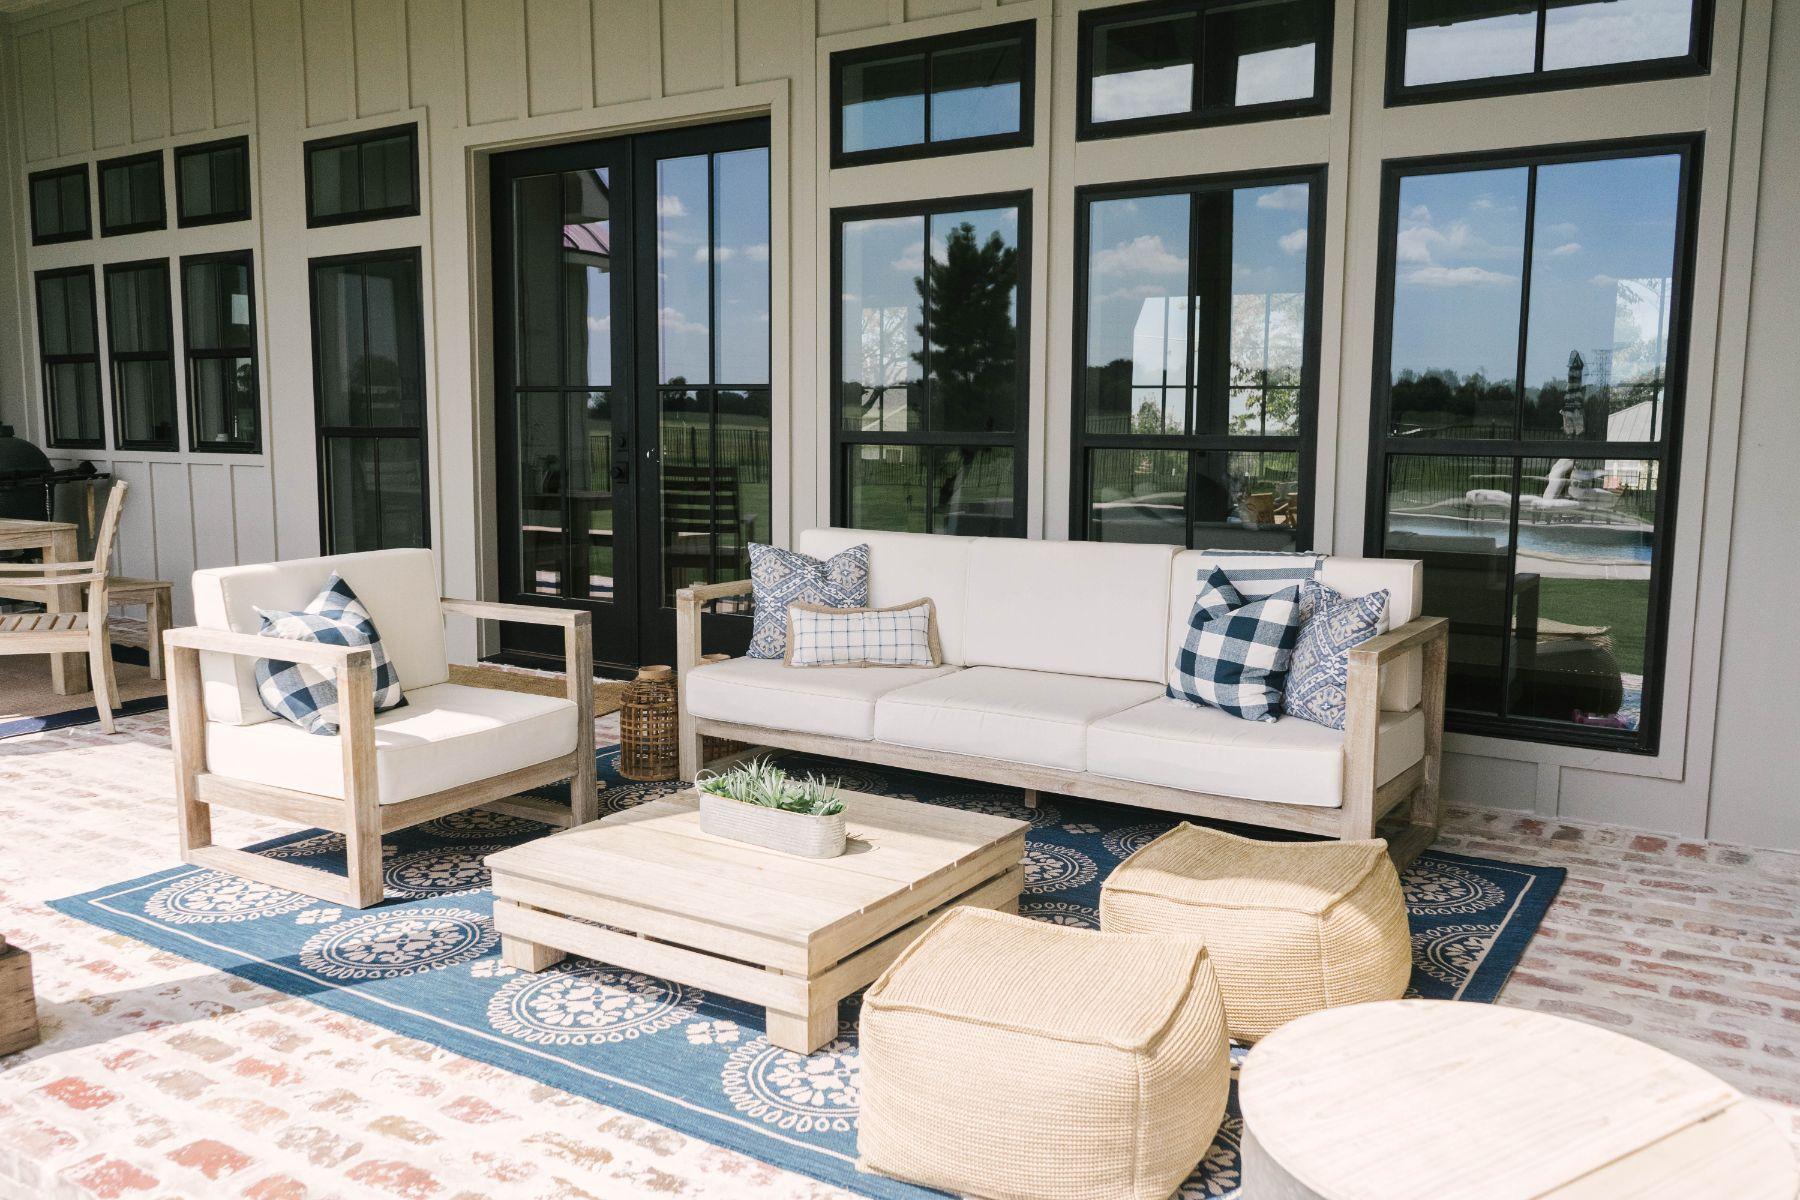 Texas Forever Farmhouse - Home Tour-03016.jpg